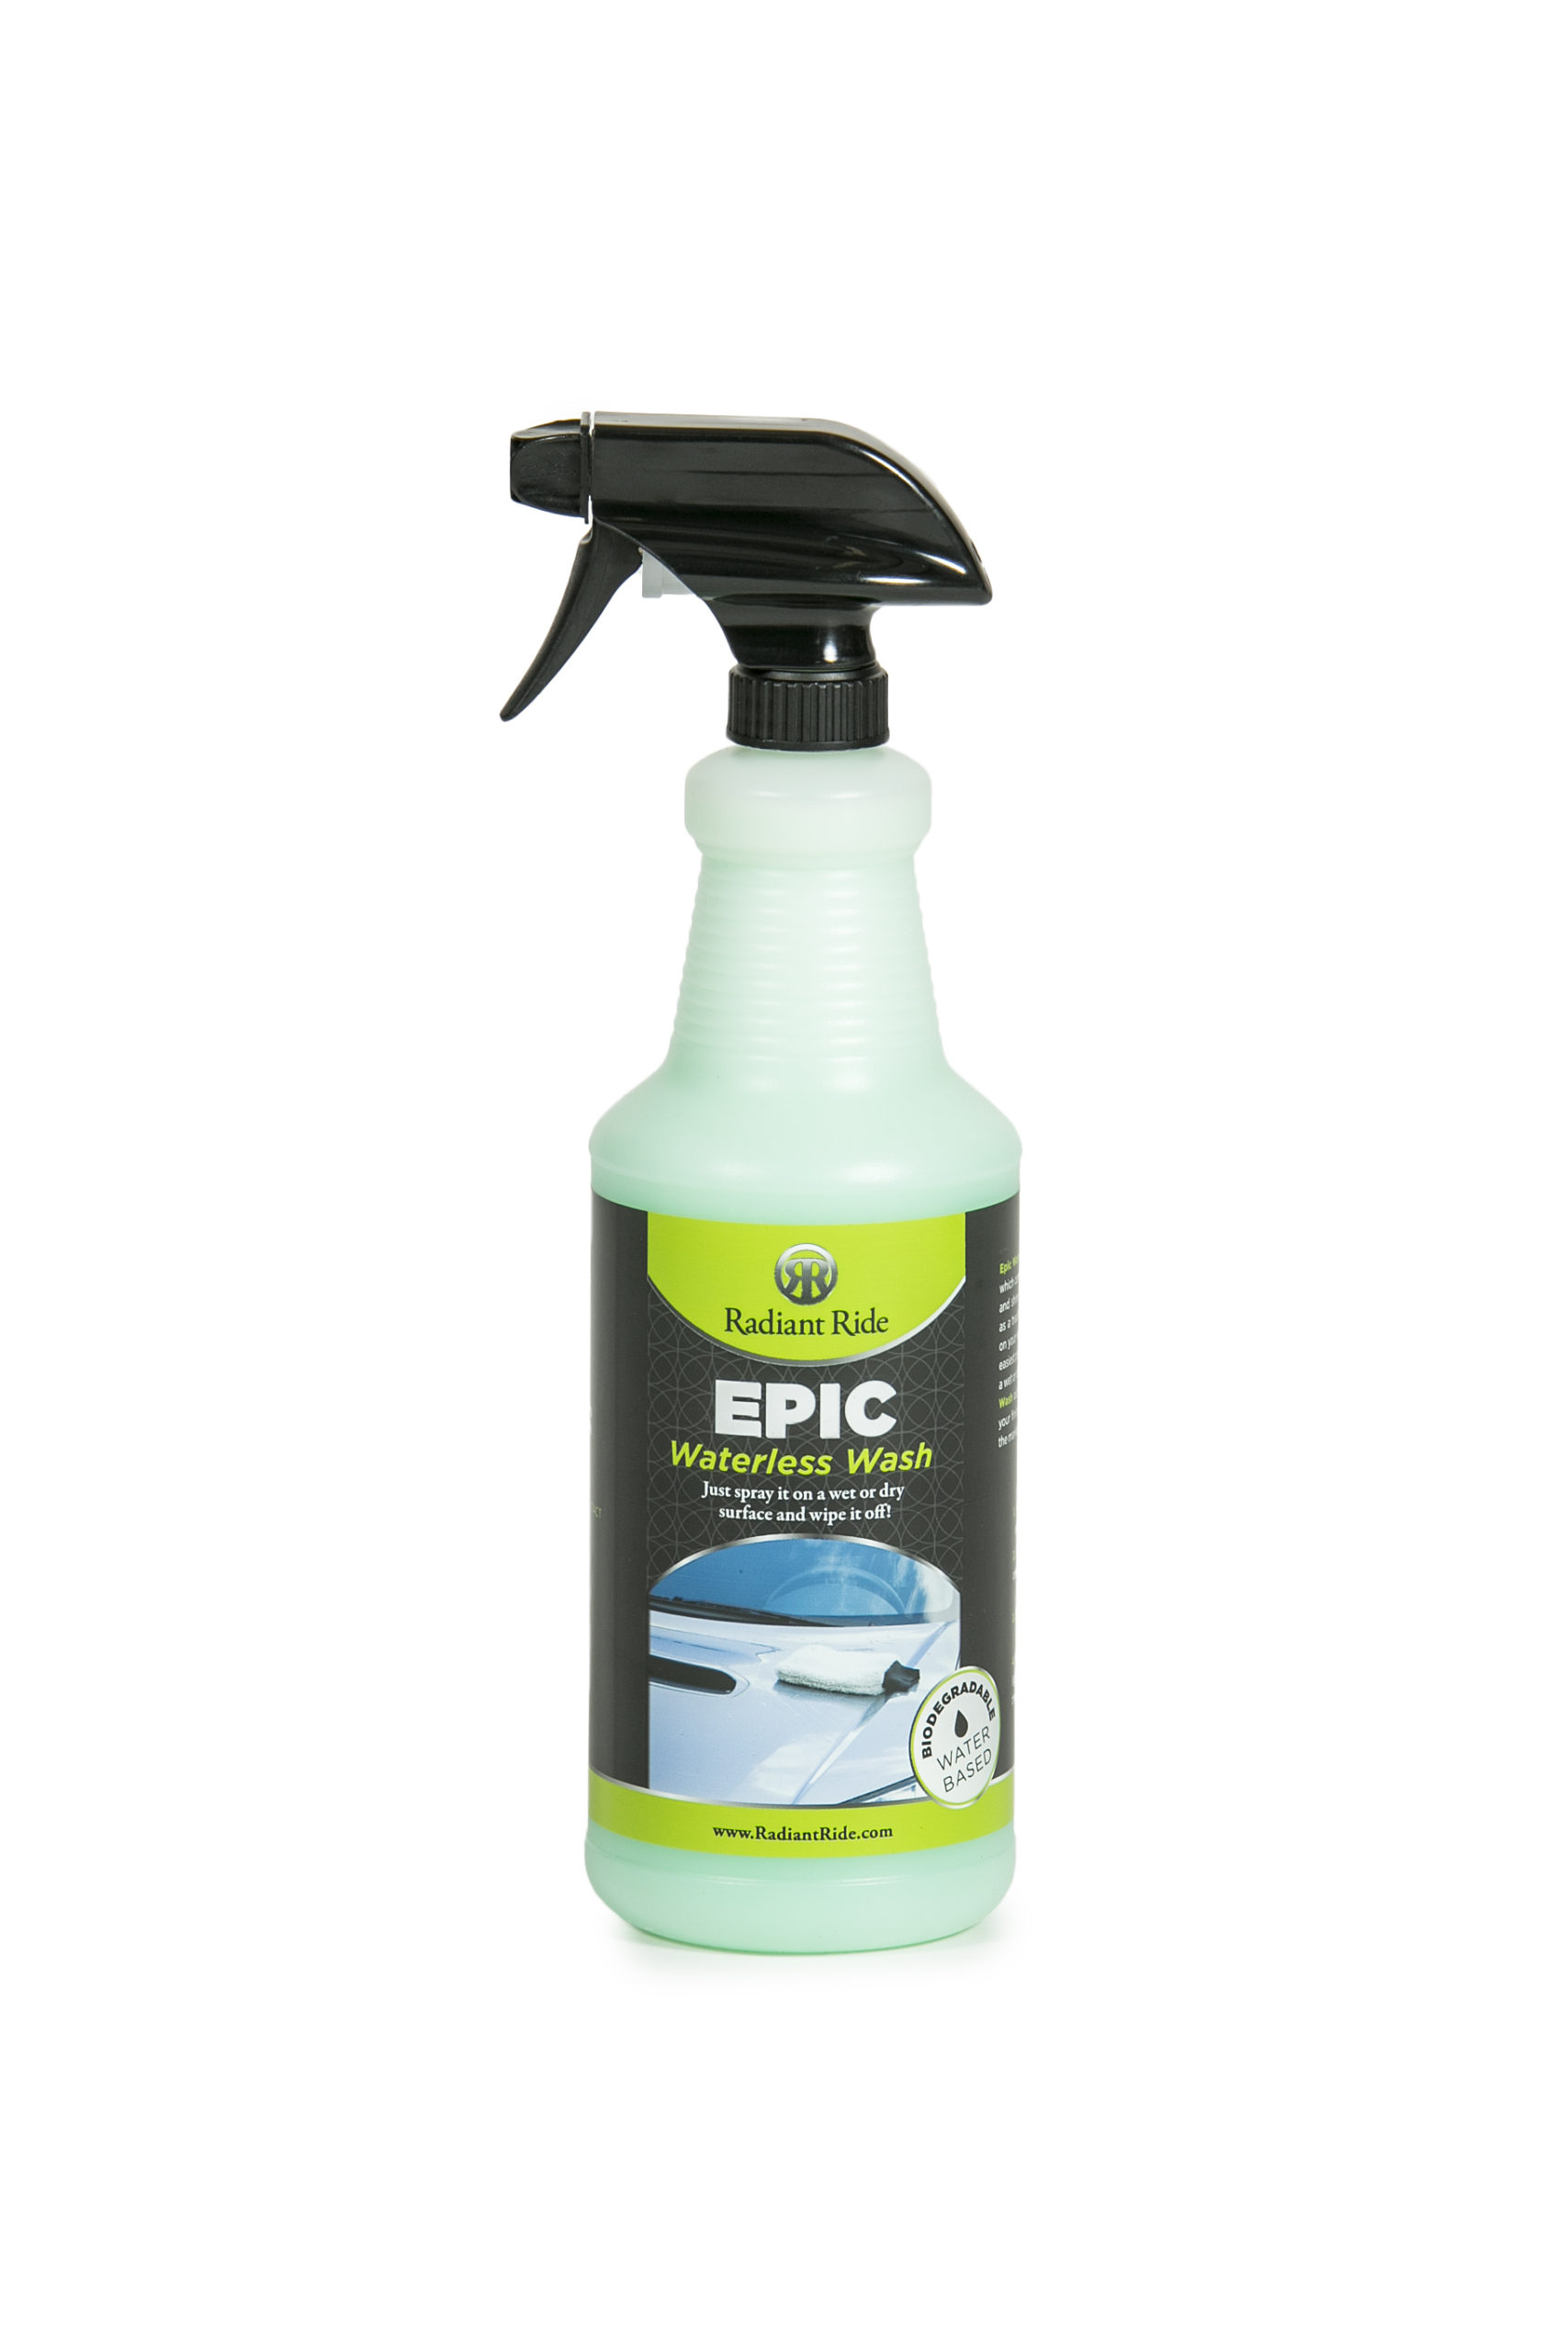 Epic Waterless Wash